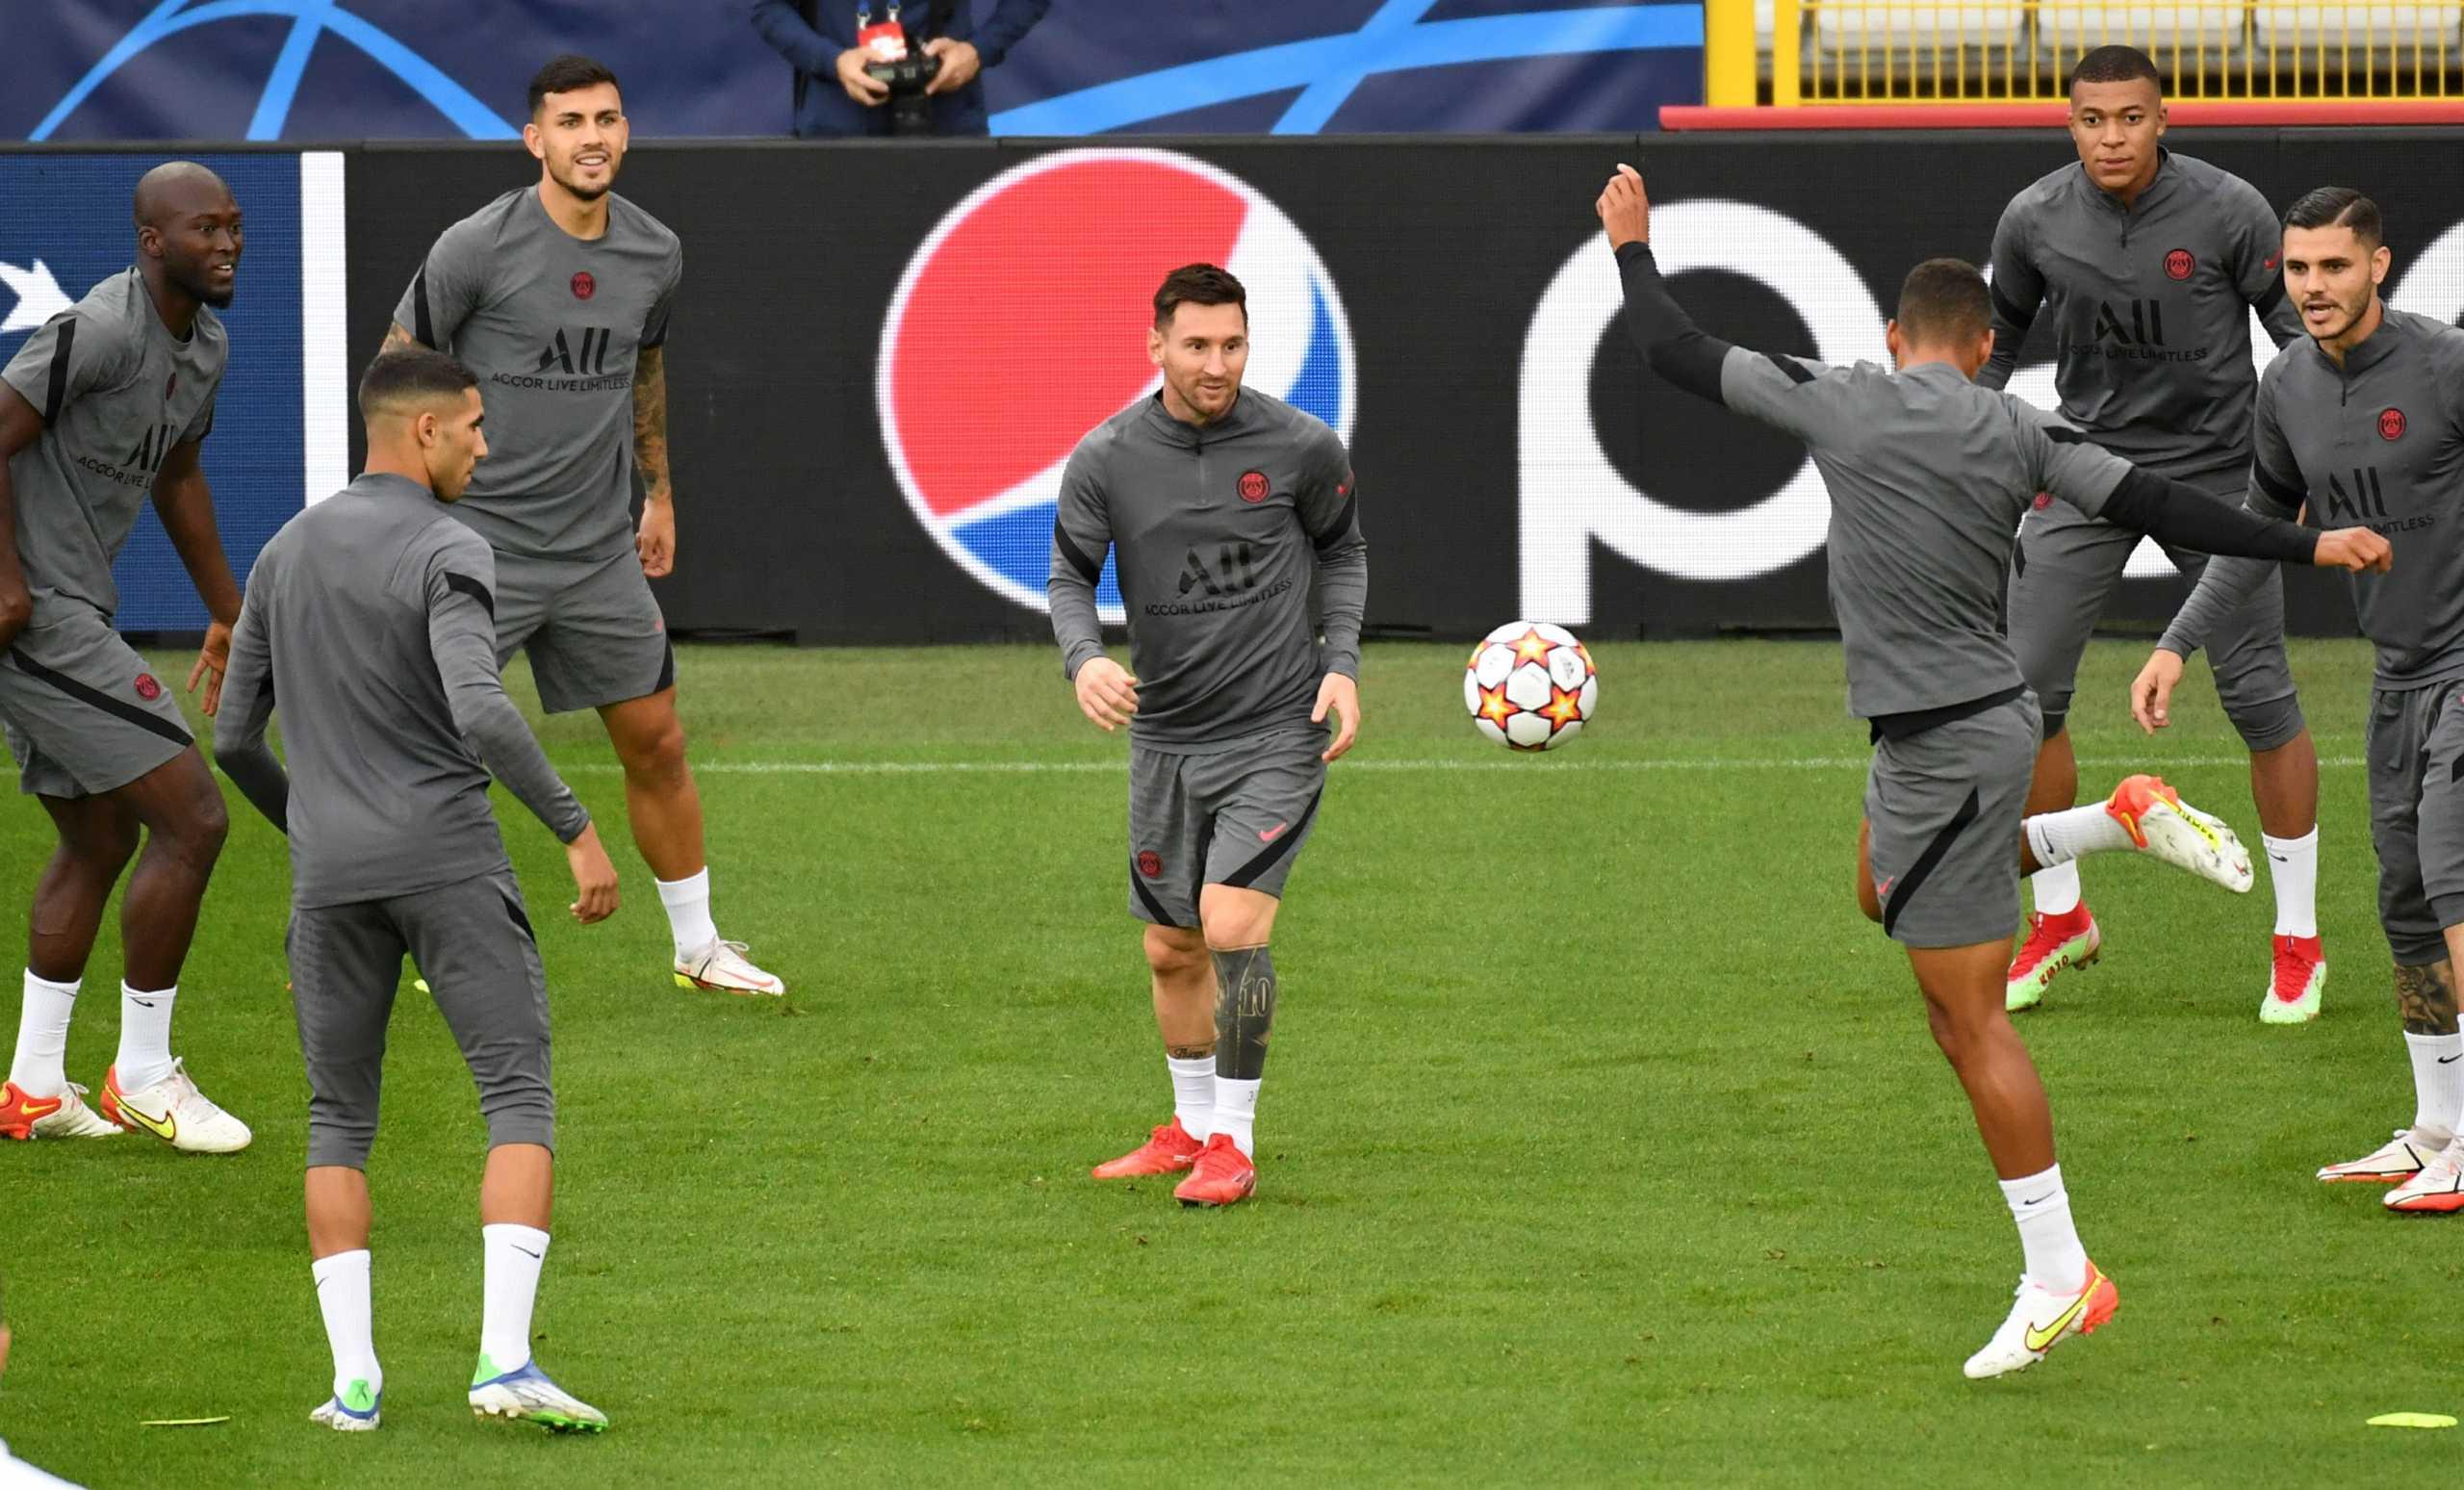 Champions League: Ίντερ – Ρεάλ και Λίβερπουλ – Μίλαν οι ματσάρες, «μπαίνει» ο Μέσι της Παρί